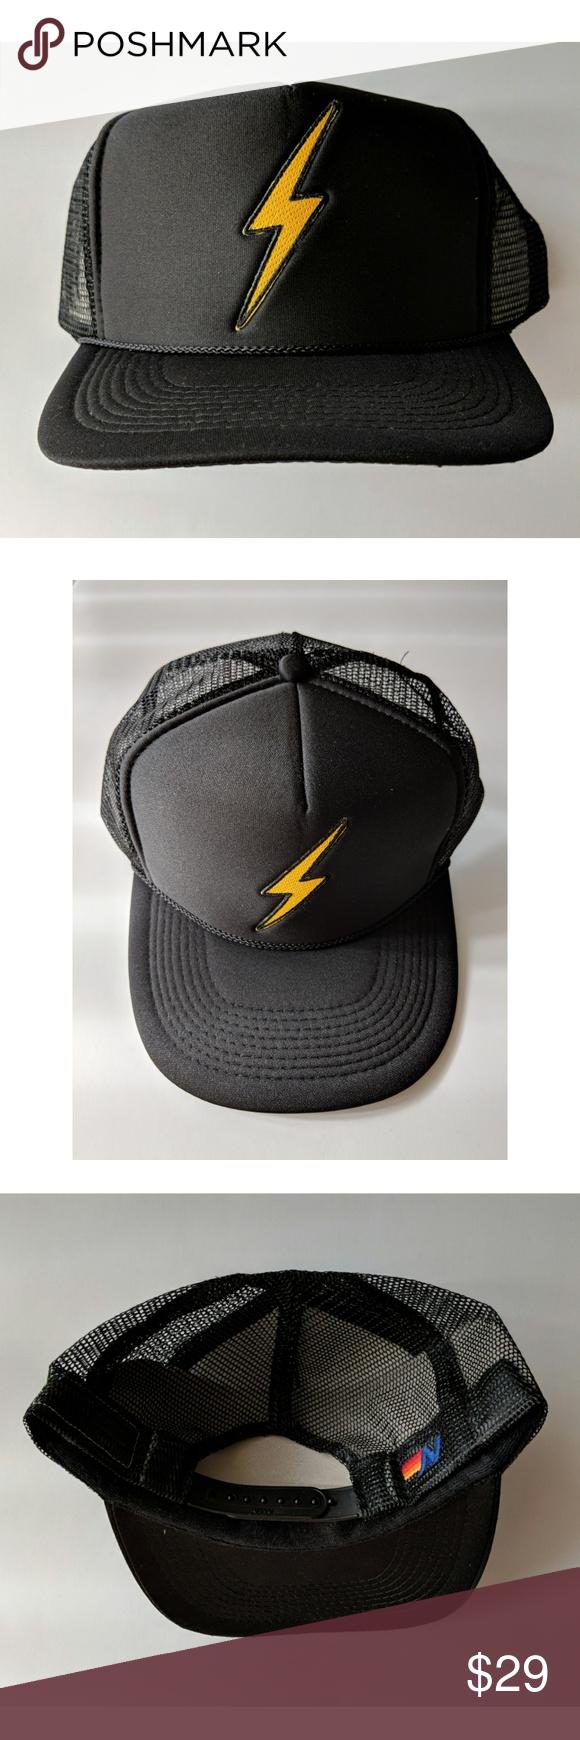 692168ed0bd Aviator Nation Vintage Trucker Hat - New Aviator Nation Vintage Bold Trucker  Hat - Size O S - New Black trucker hat with gold   yellow lightning bolt ...